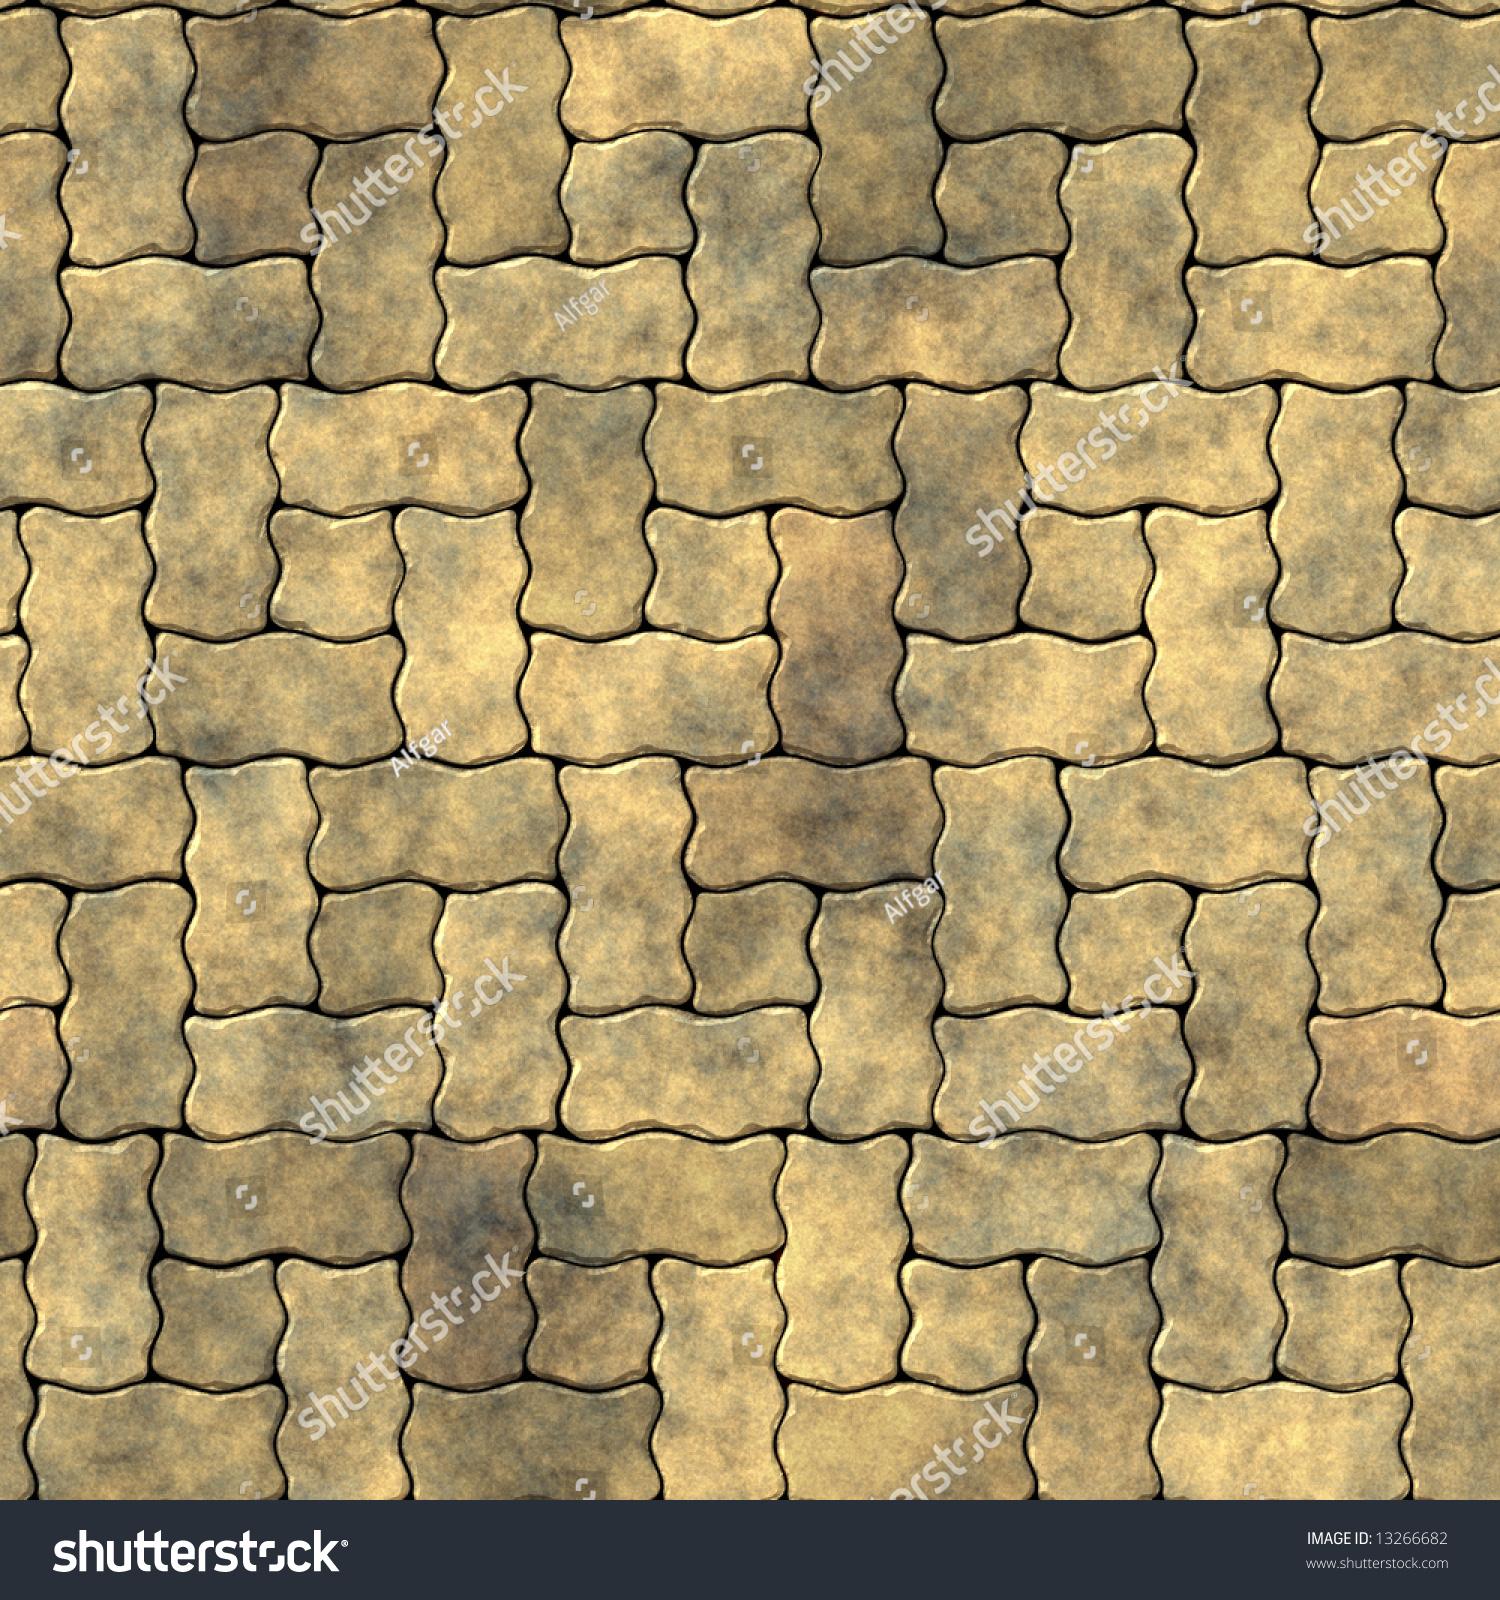 Luxury Seamless Decorative Stone Wall Textures Illustration - Art ...